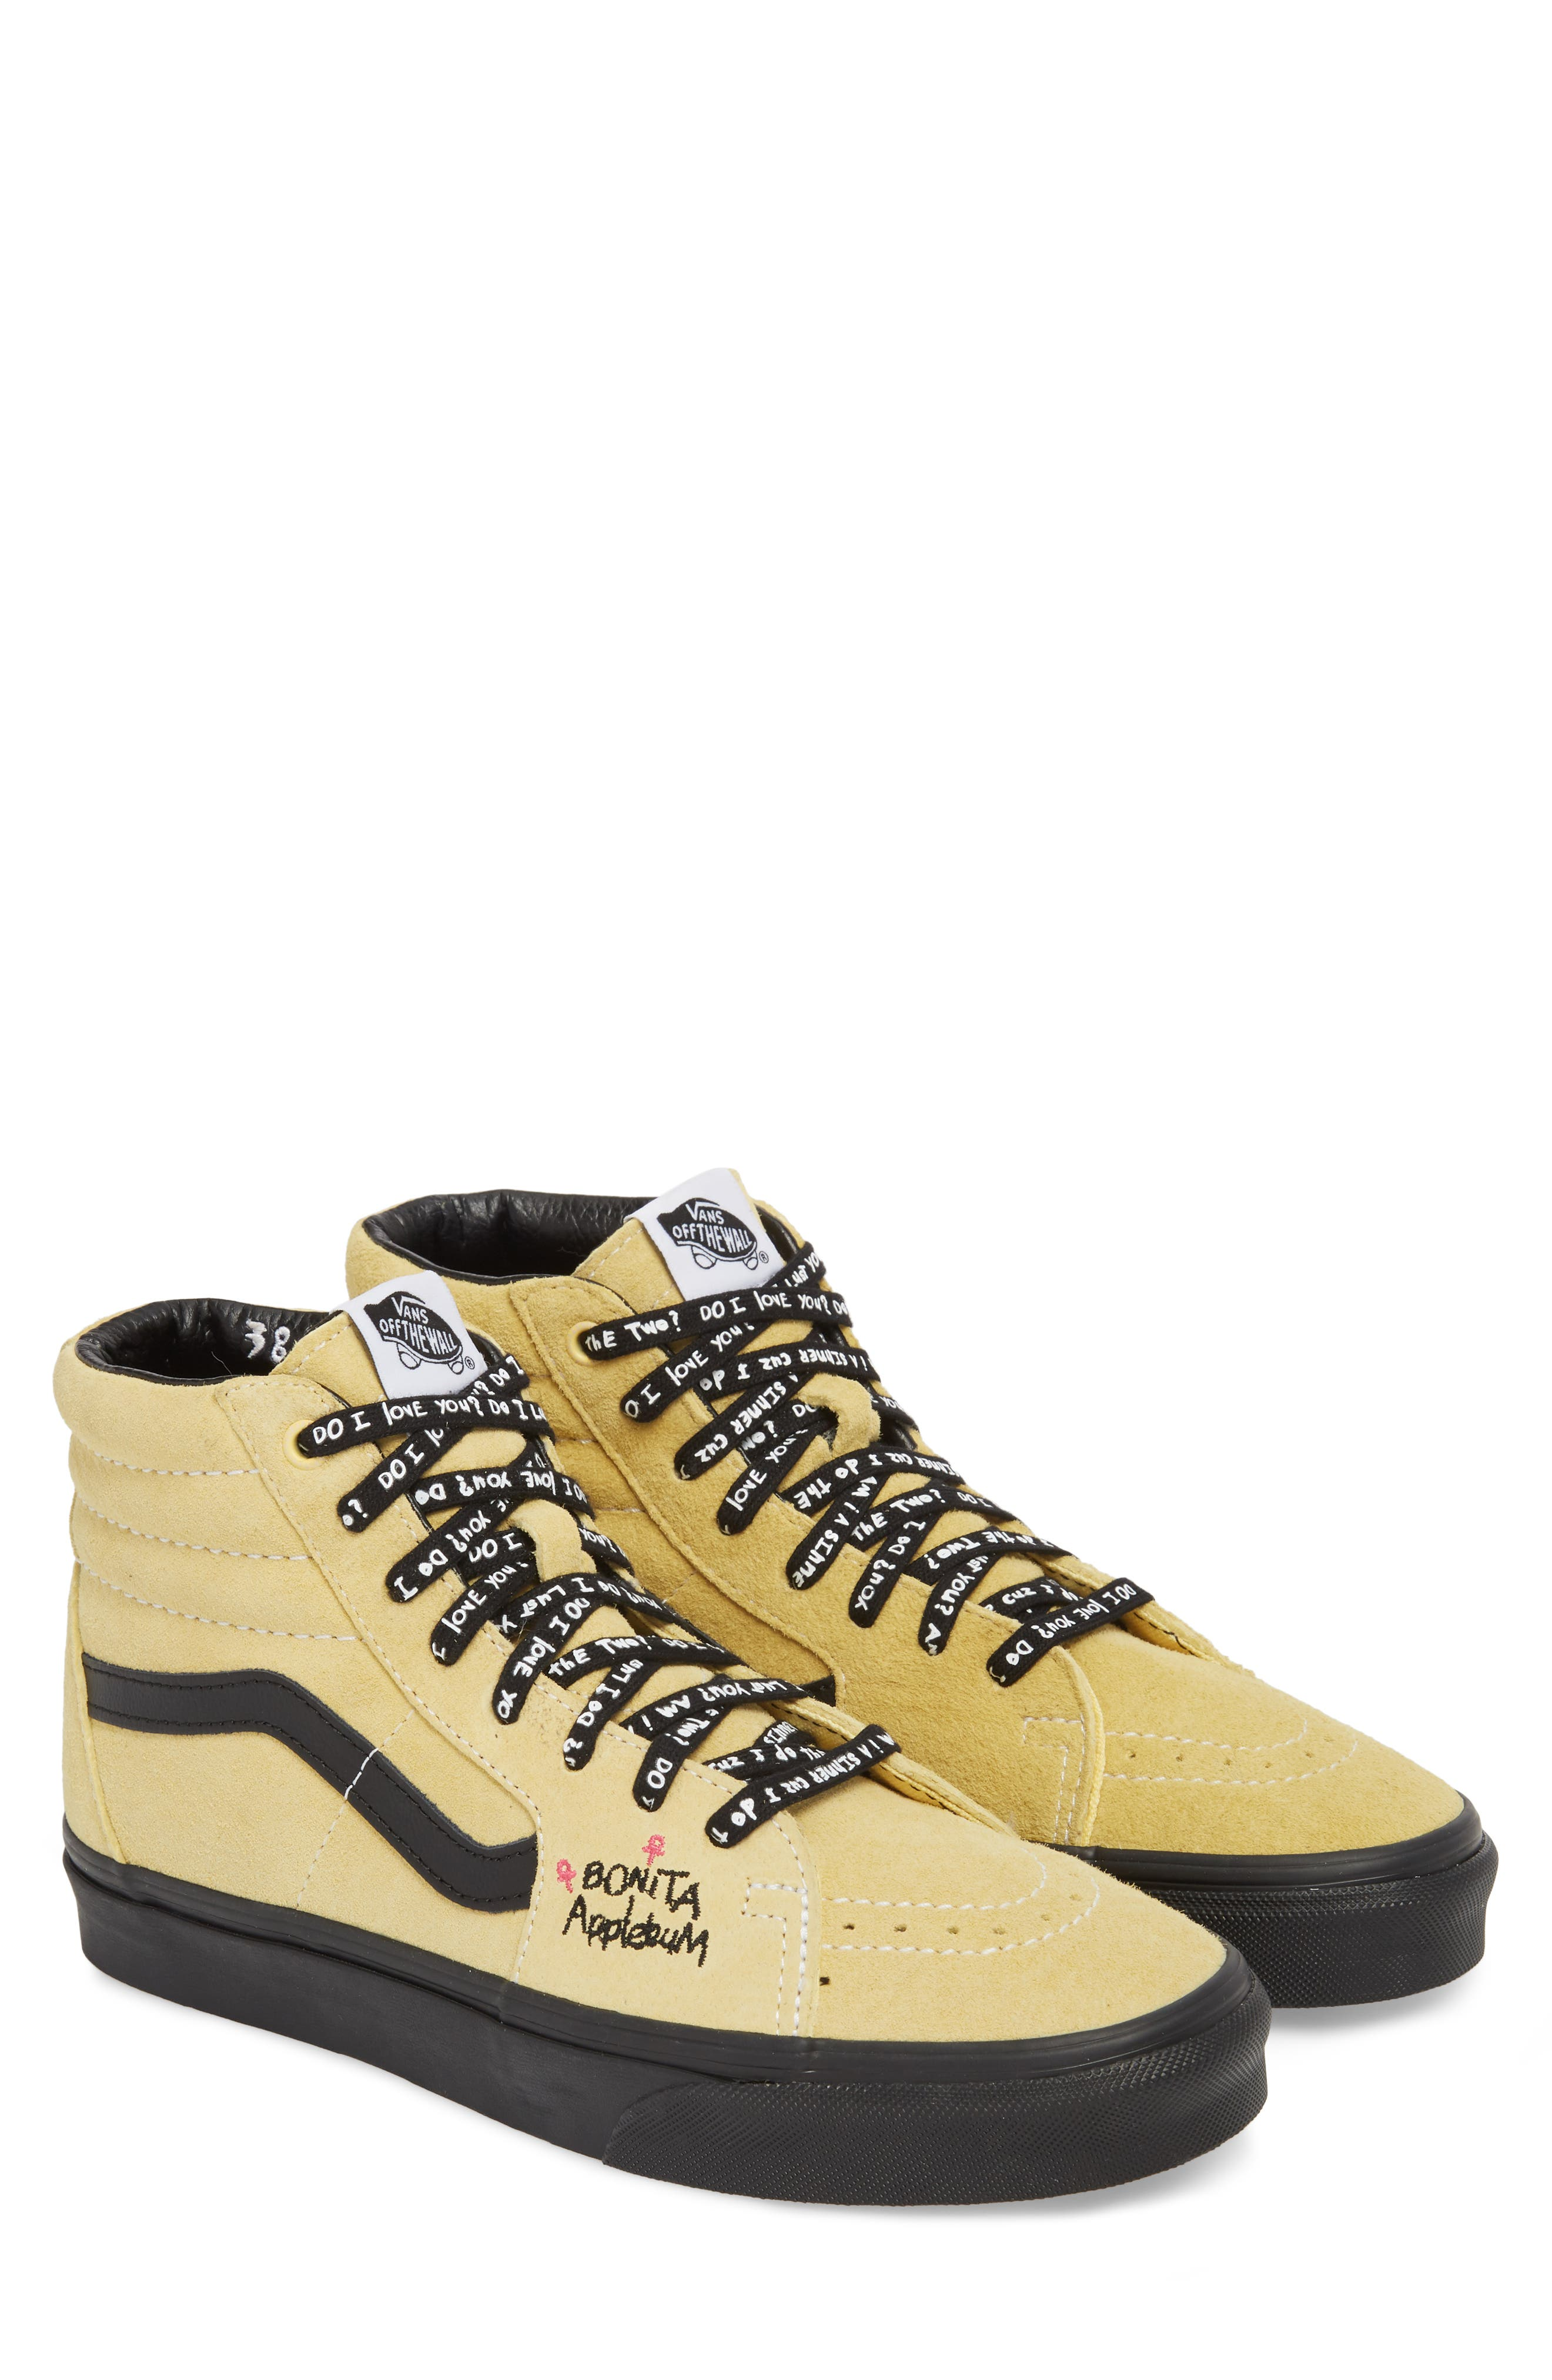 ATCQ Sk8-Hi Sneaker,                         Main,                         color, Mellow Yellow/ Spectra Yellow